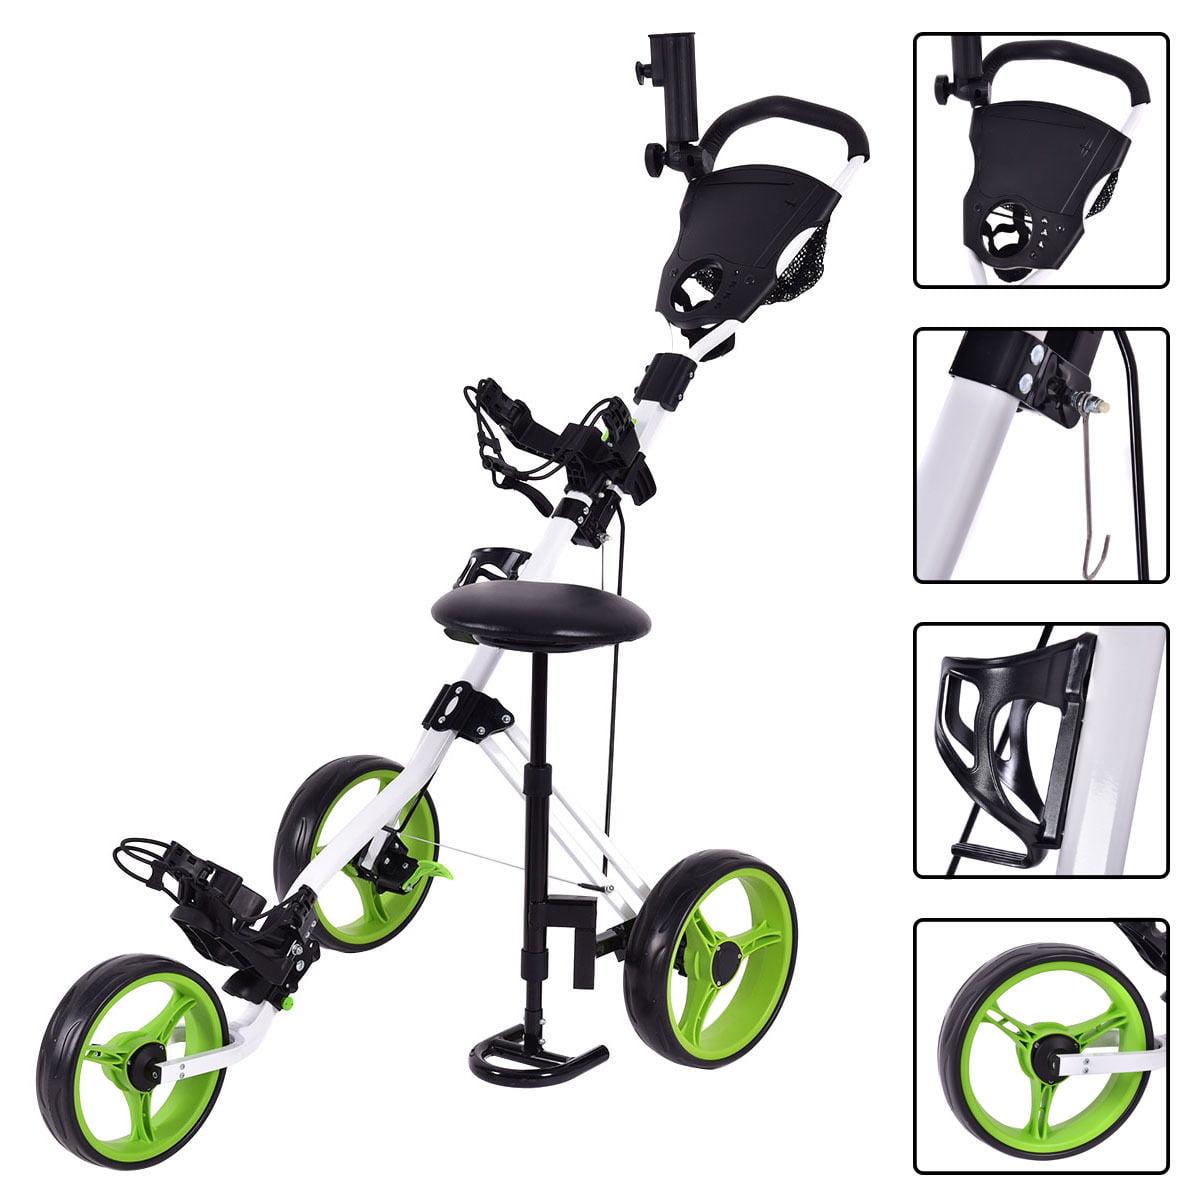 Costway Foldable 3 Wheel Push Pull Golf Club Cart Trolley w Seat Scoreboard Bag Swivel by Costway